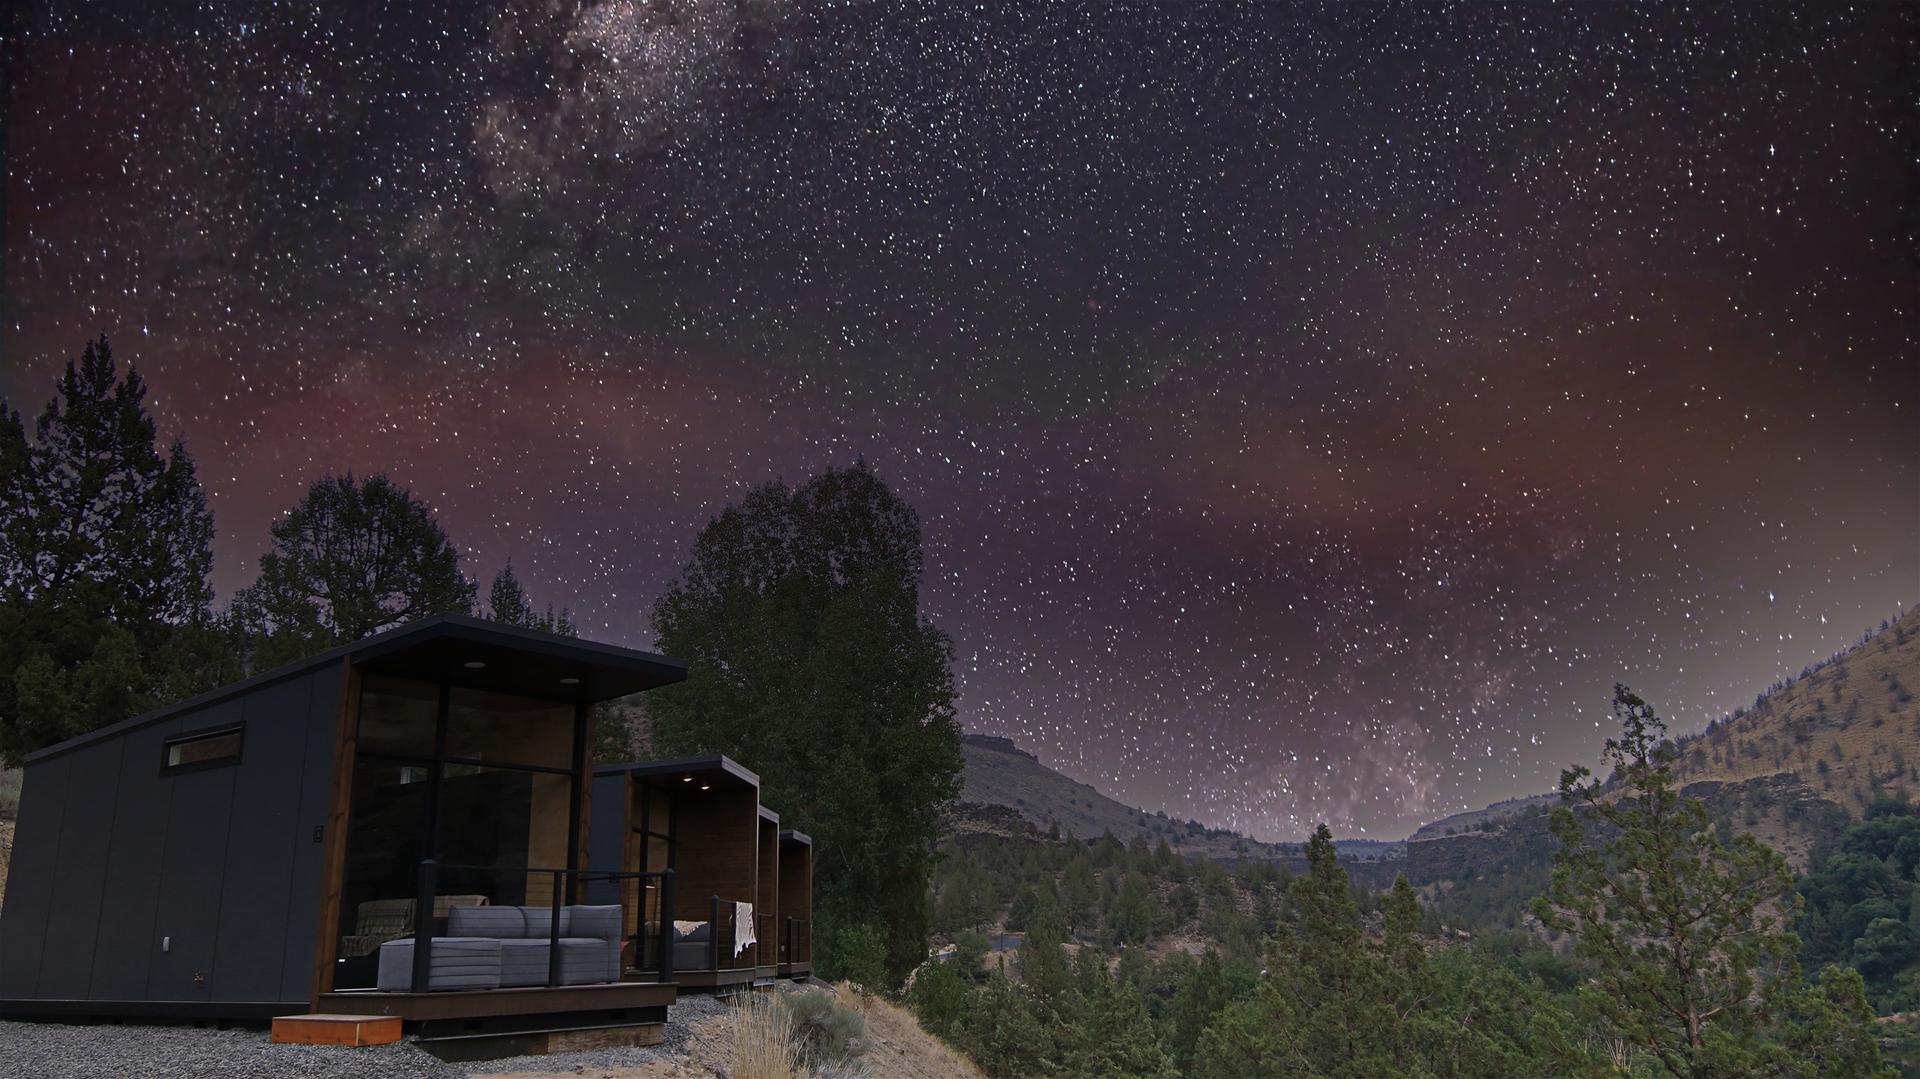 Stars over Crown Point at Lake Simtustus Resort